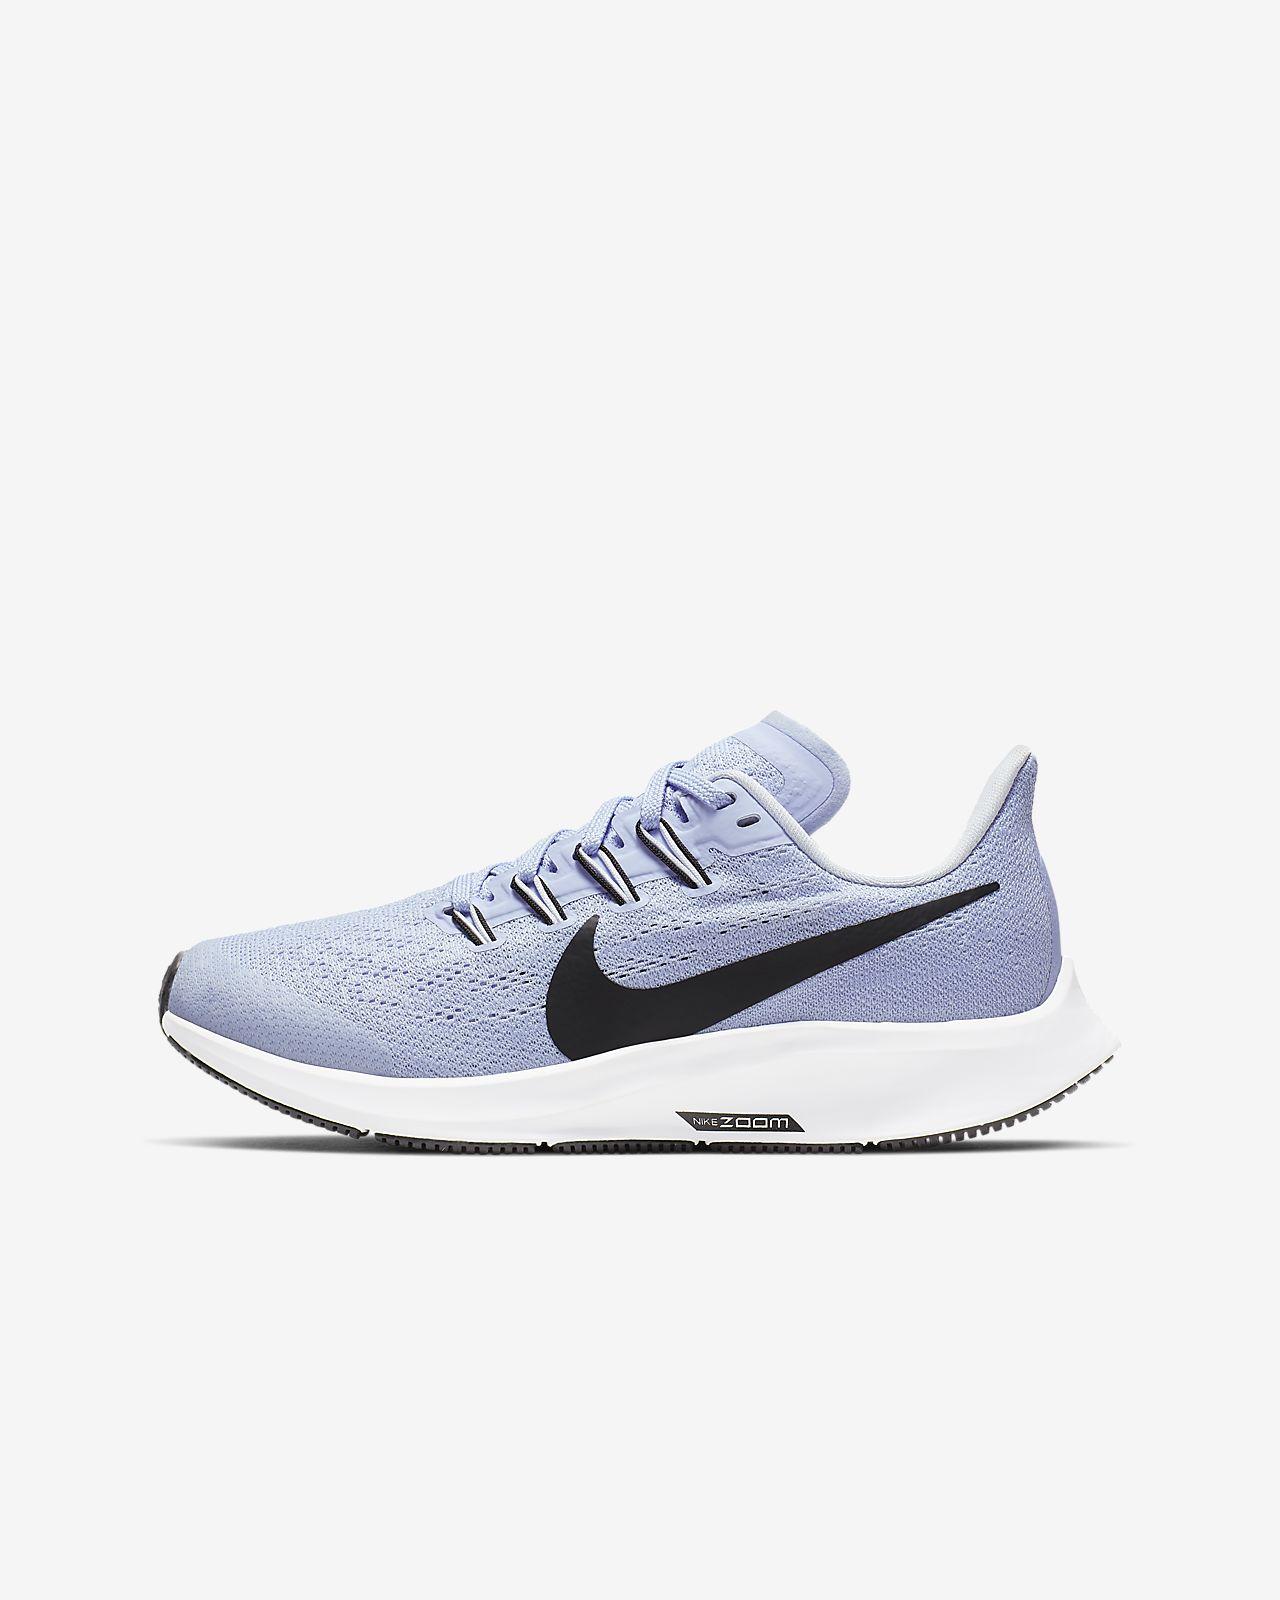 Nike Air Zoom Pegasus 36 Laufschuh für jüngere/ältere Kinder